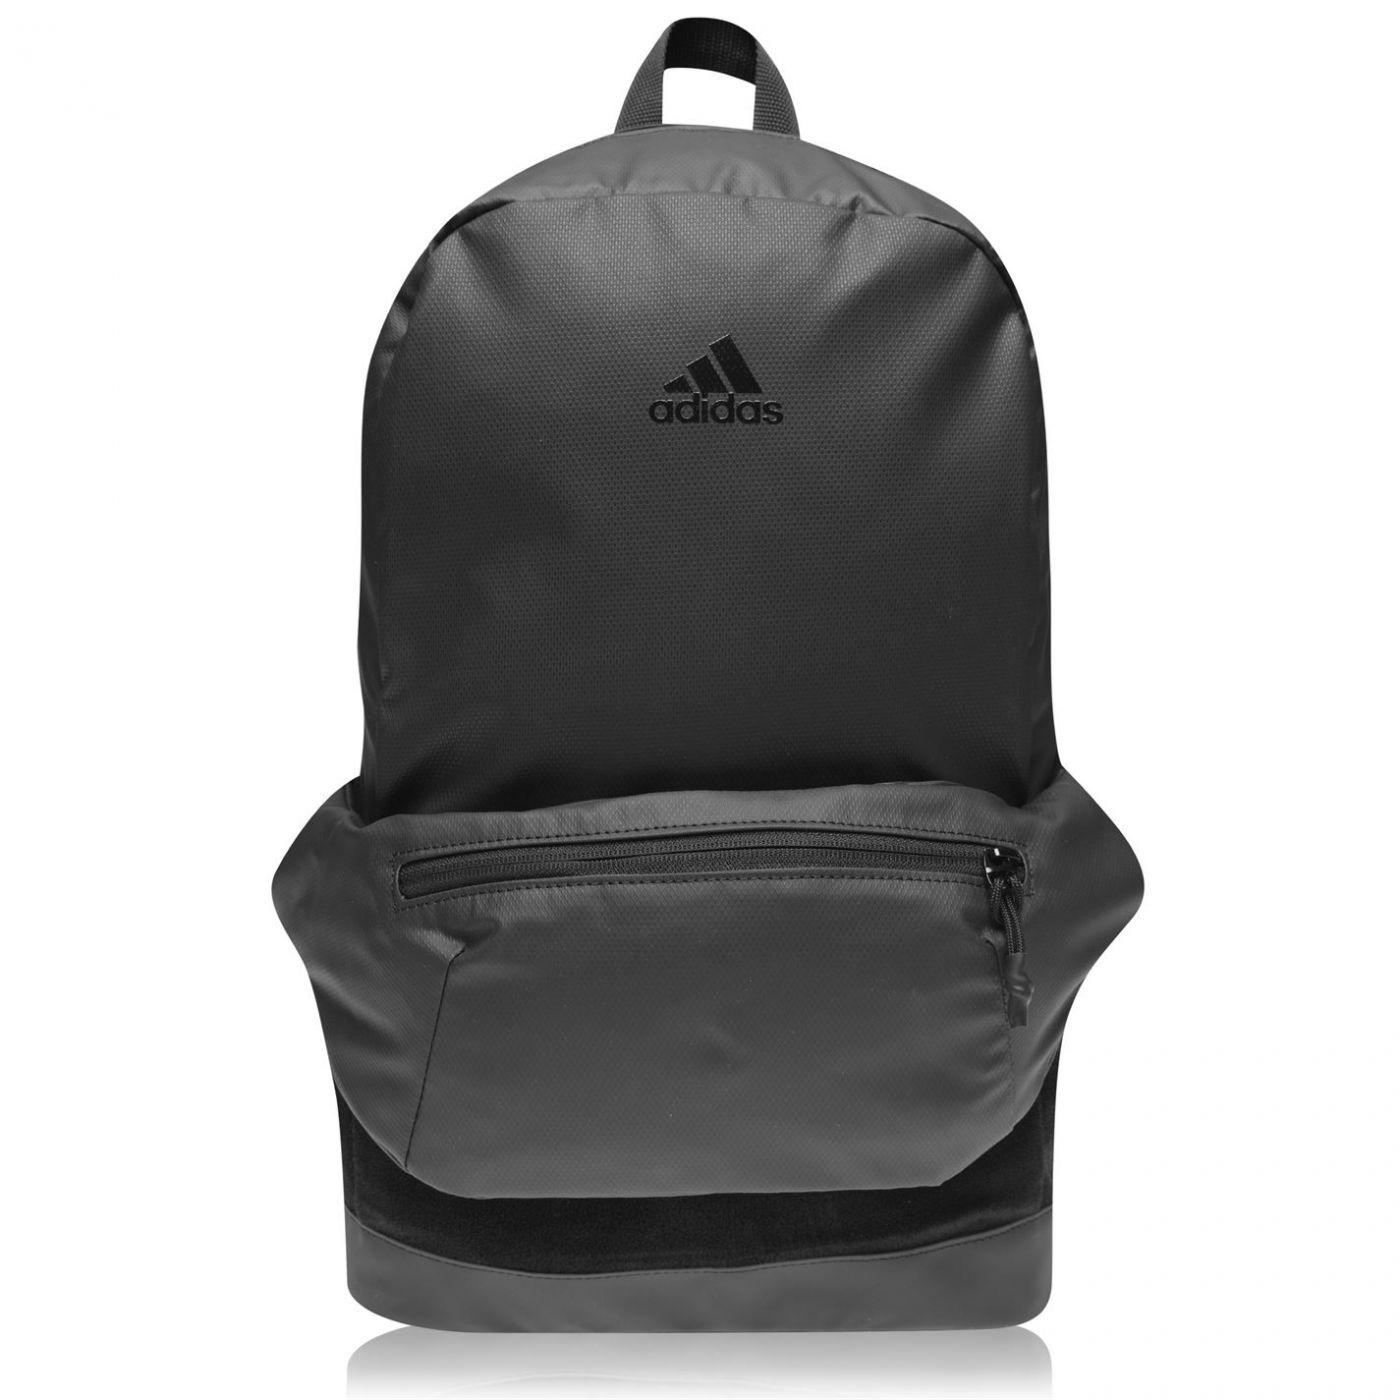 Adidas Adapt Backpack